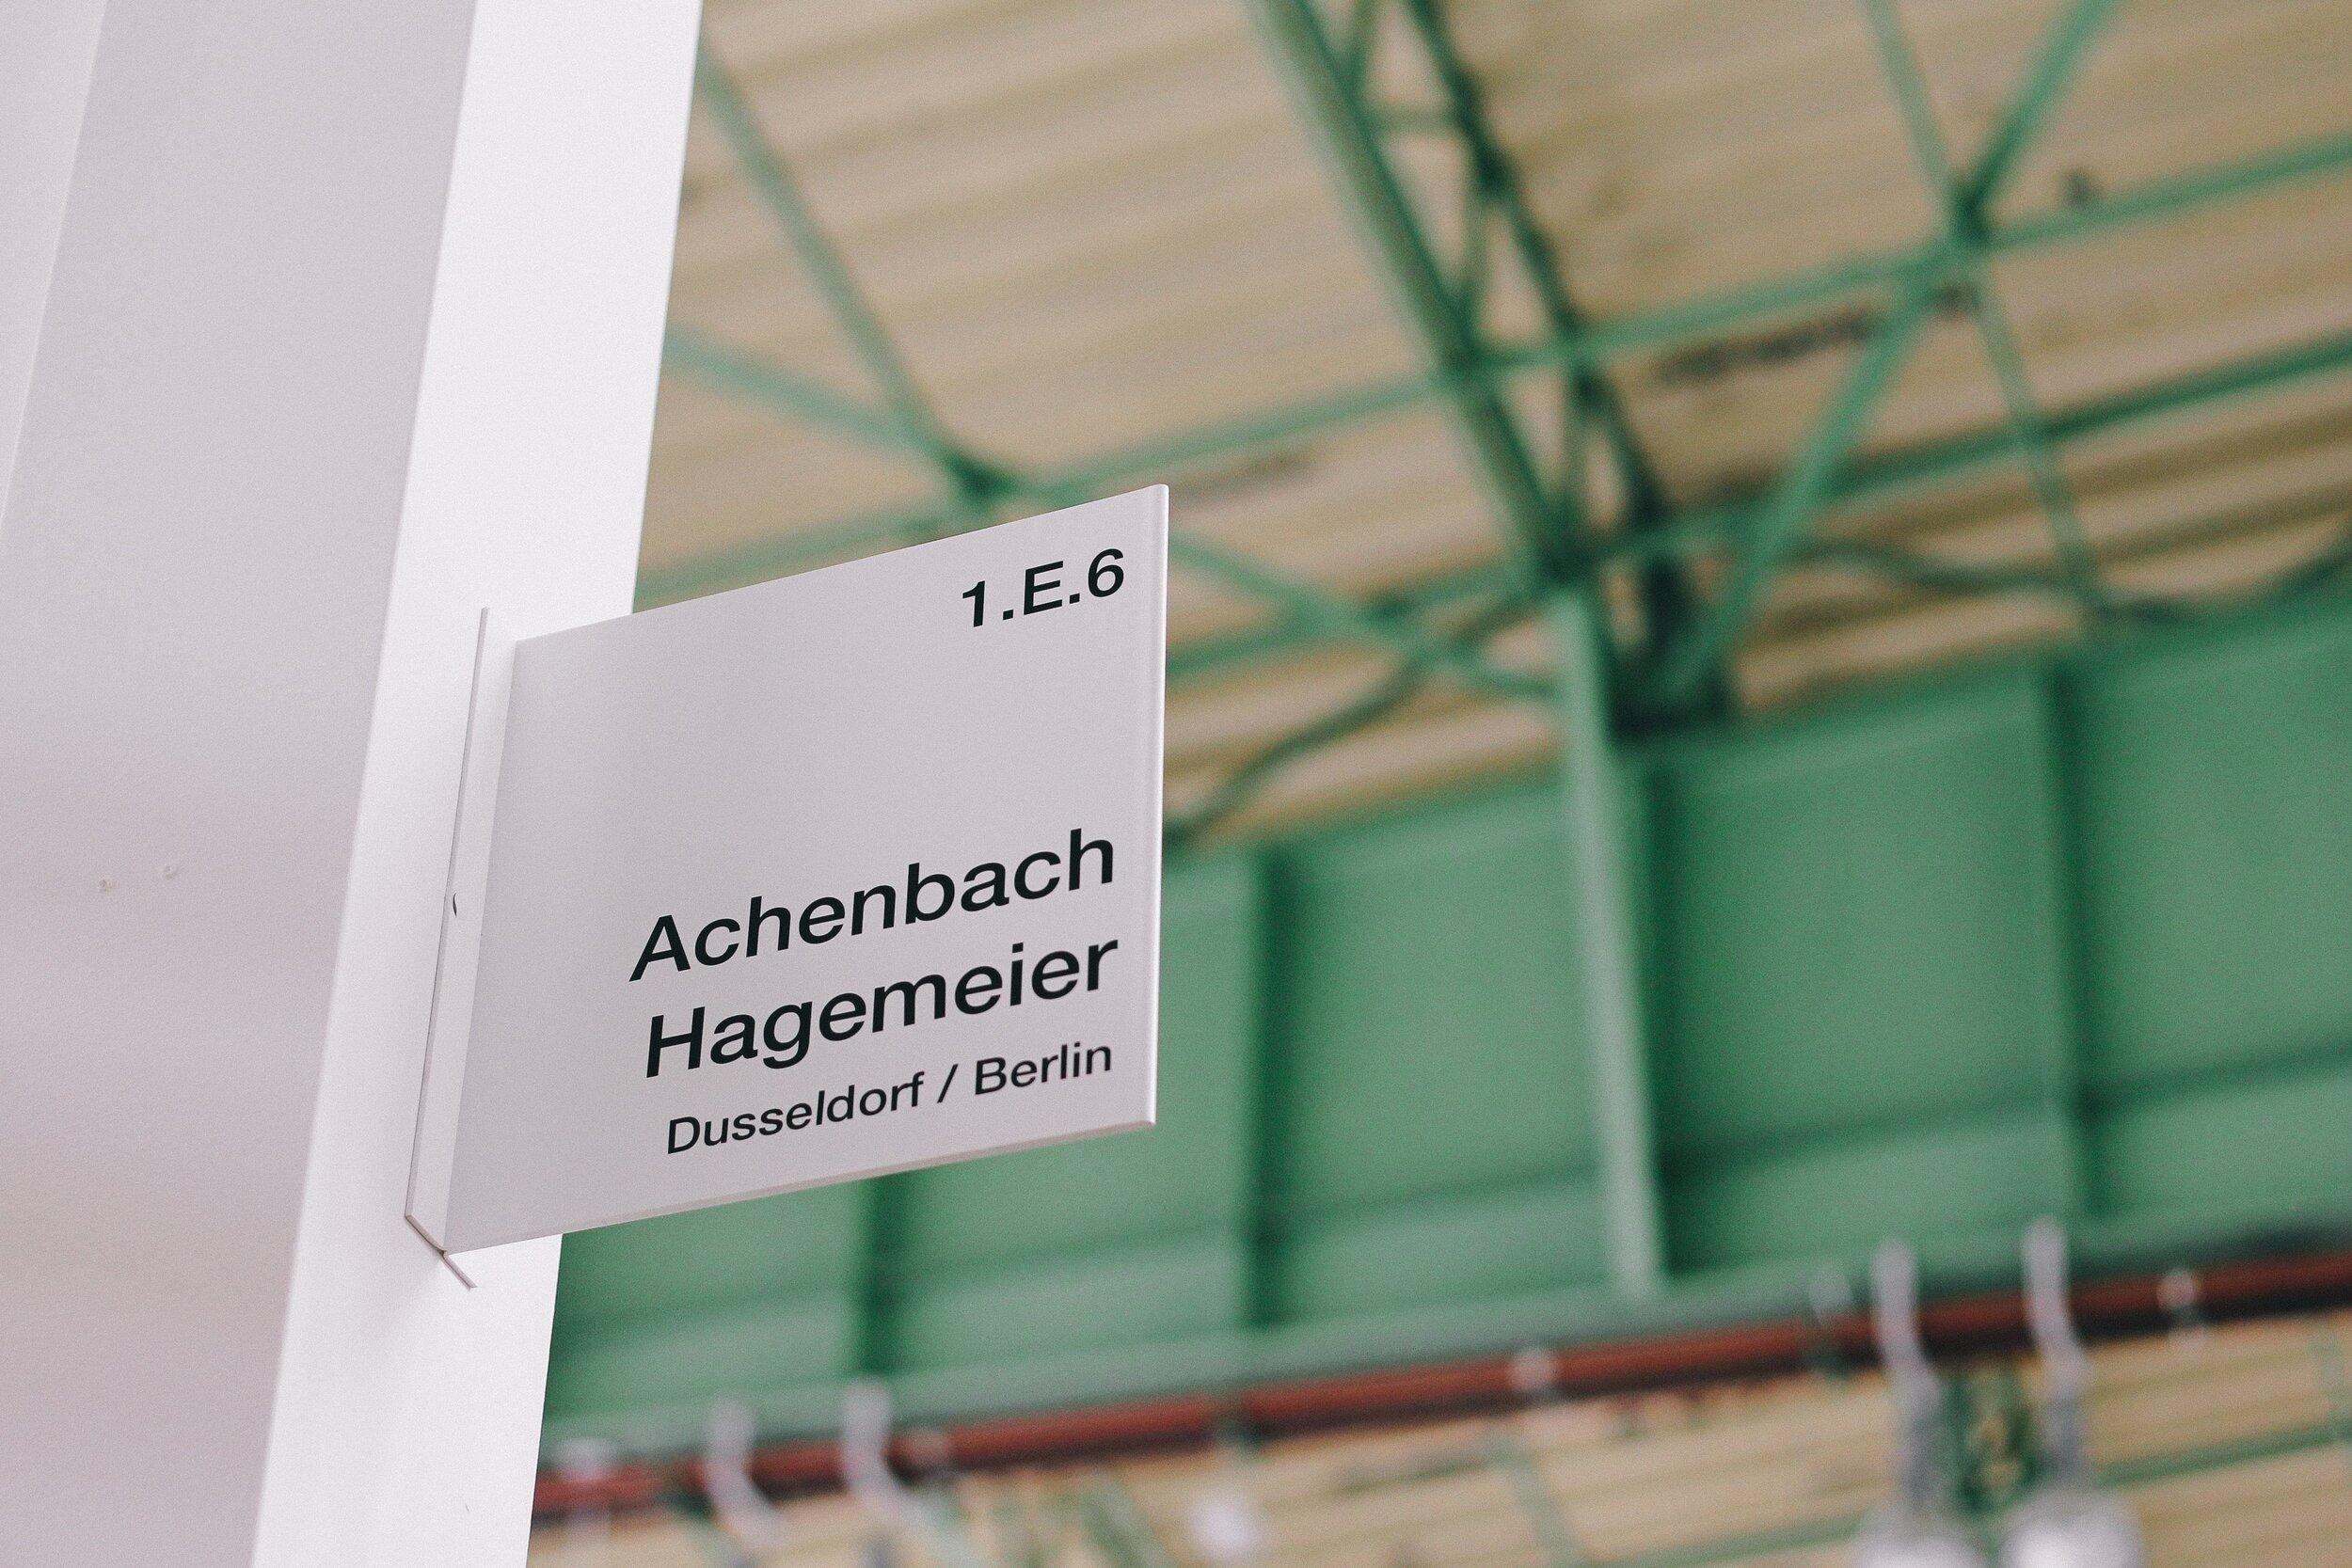 unu_Achenbach_Hagemeier_132.jpg